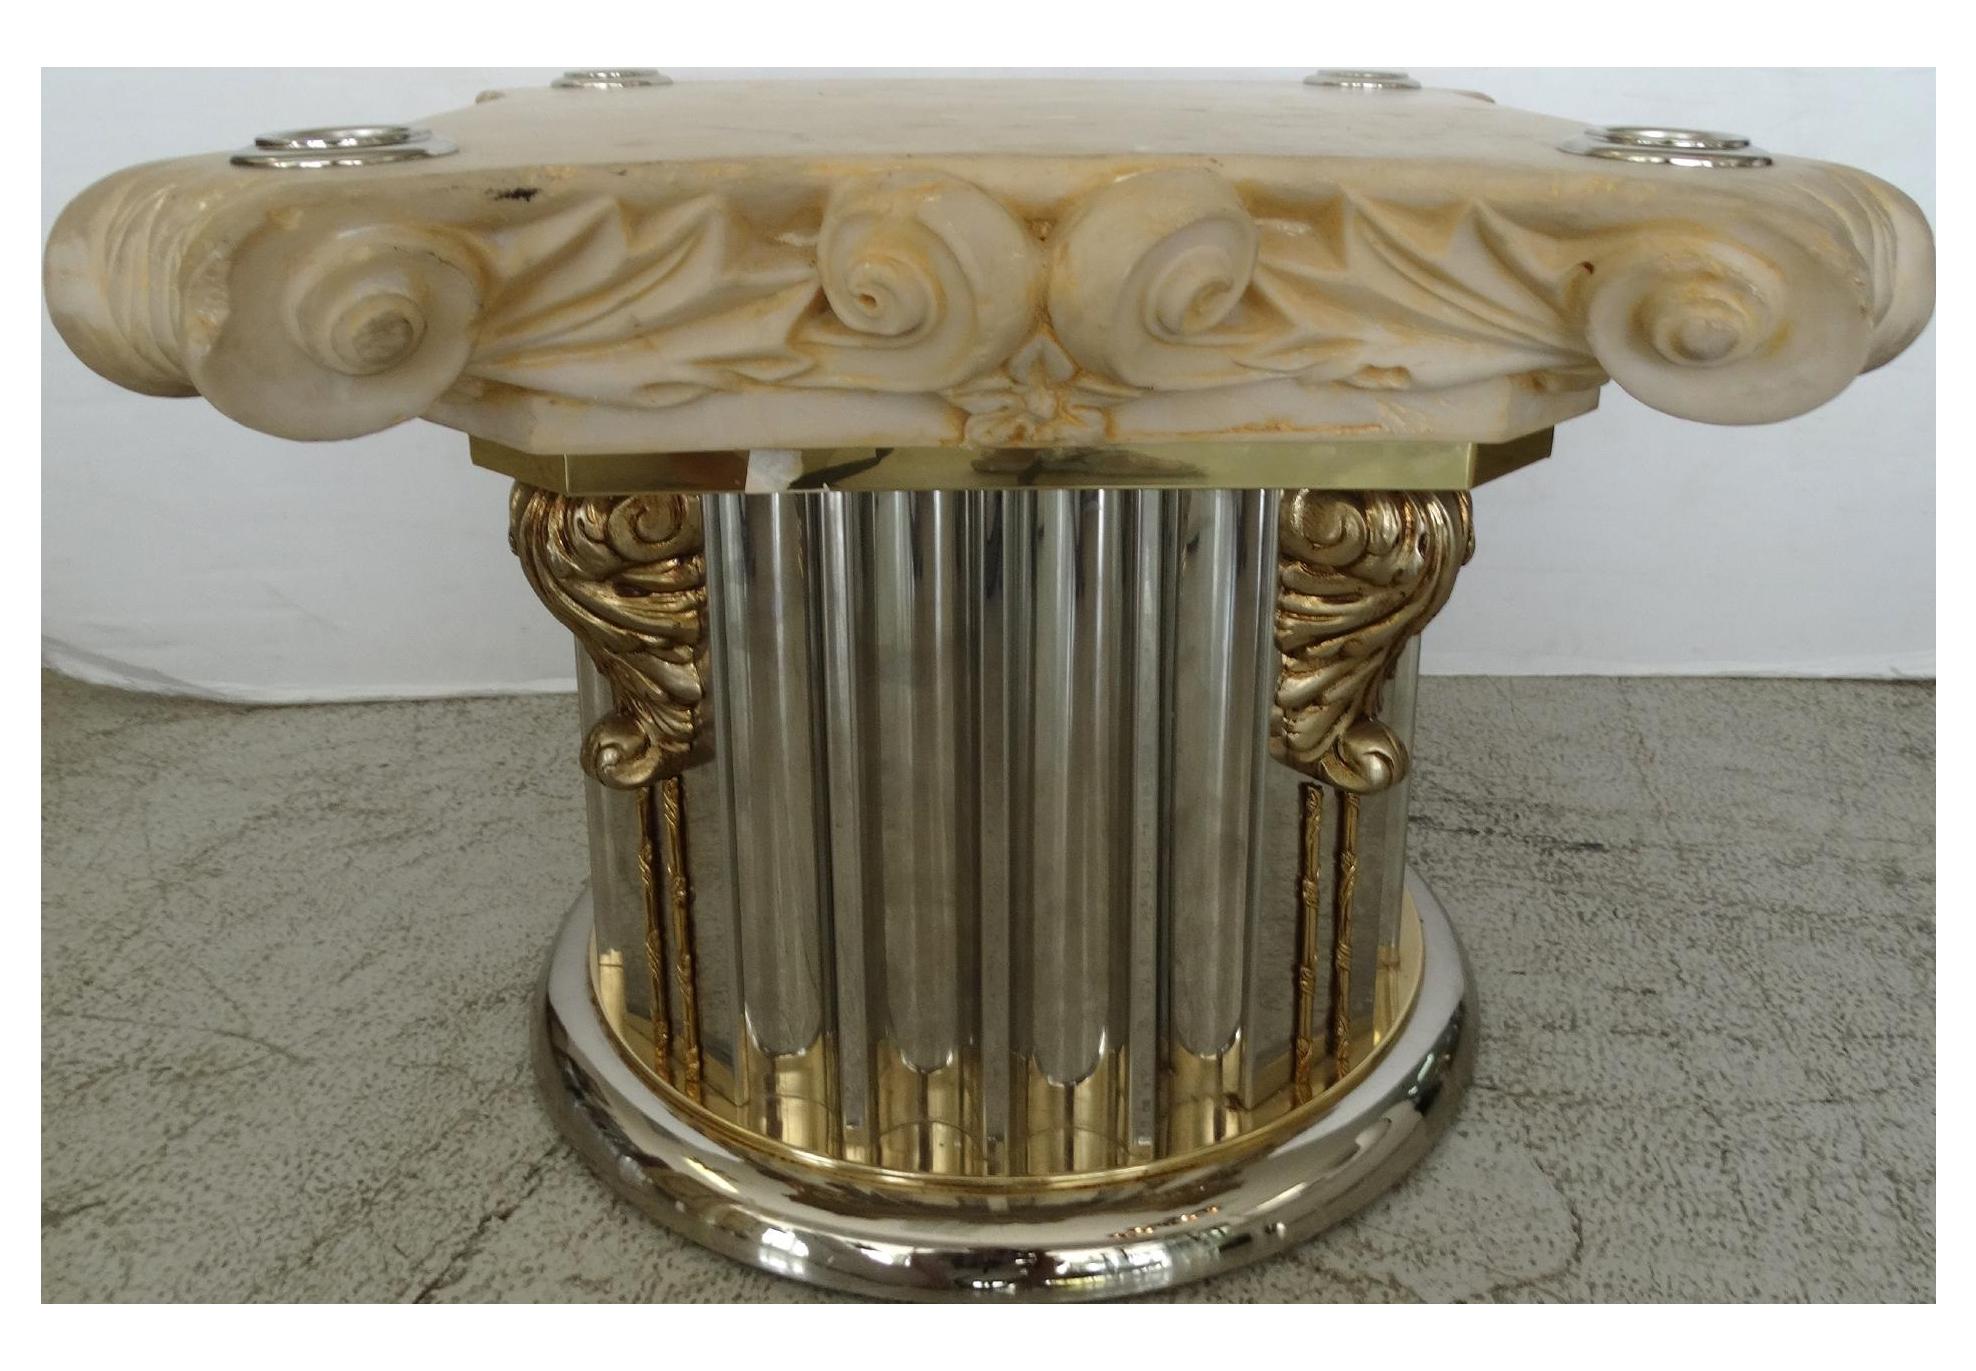 Corinthian Column Capital Table Base Chairish : 49a5918e cd5d 46eb 9471 113a73eadc2daspectfitampwidth640ampheight640 from www.chairish.com size 640 x 640 jpeg 32kB